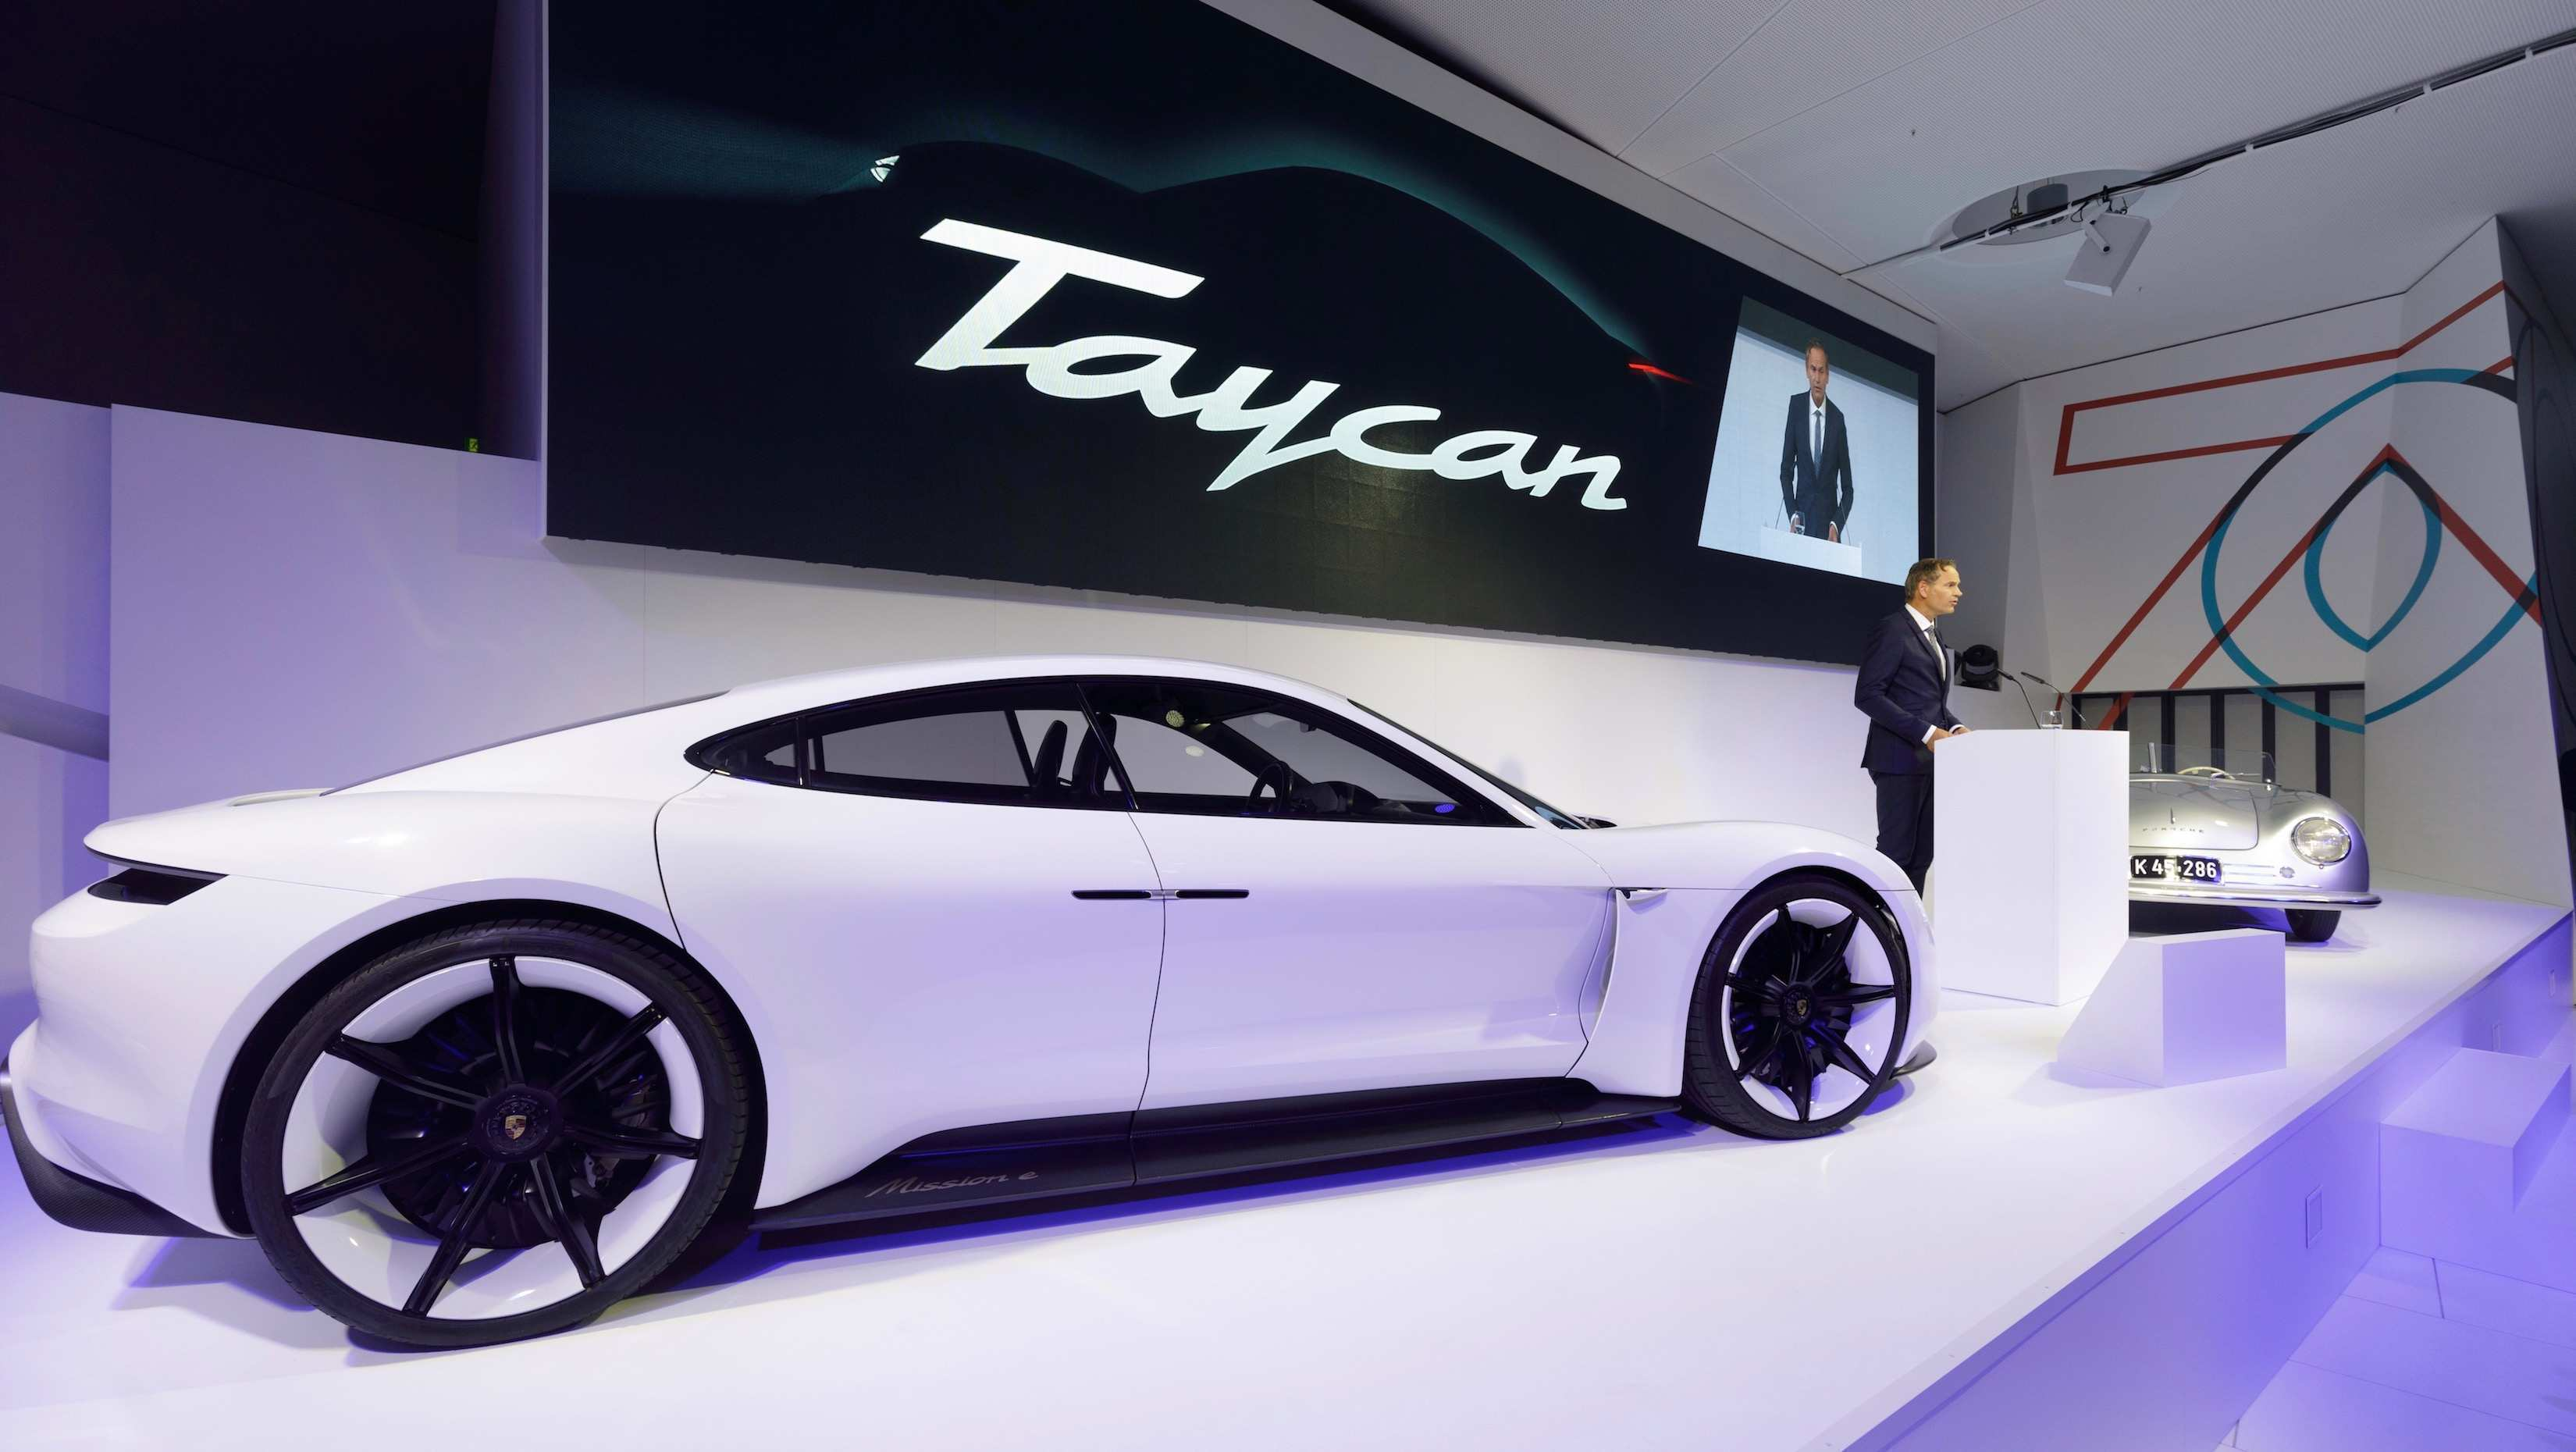 80 Concept of 2019 Porsche Taycan Specs for 2019 Porsche Taycan